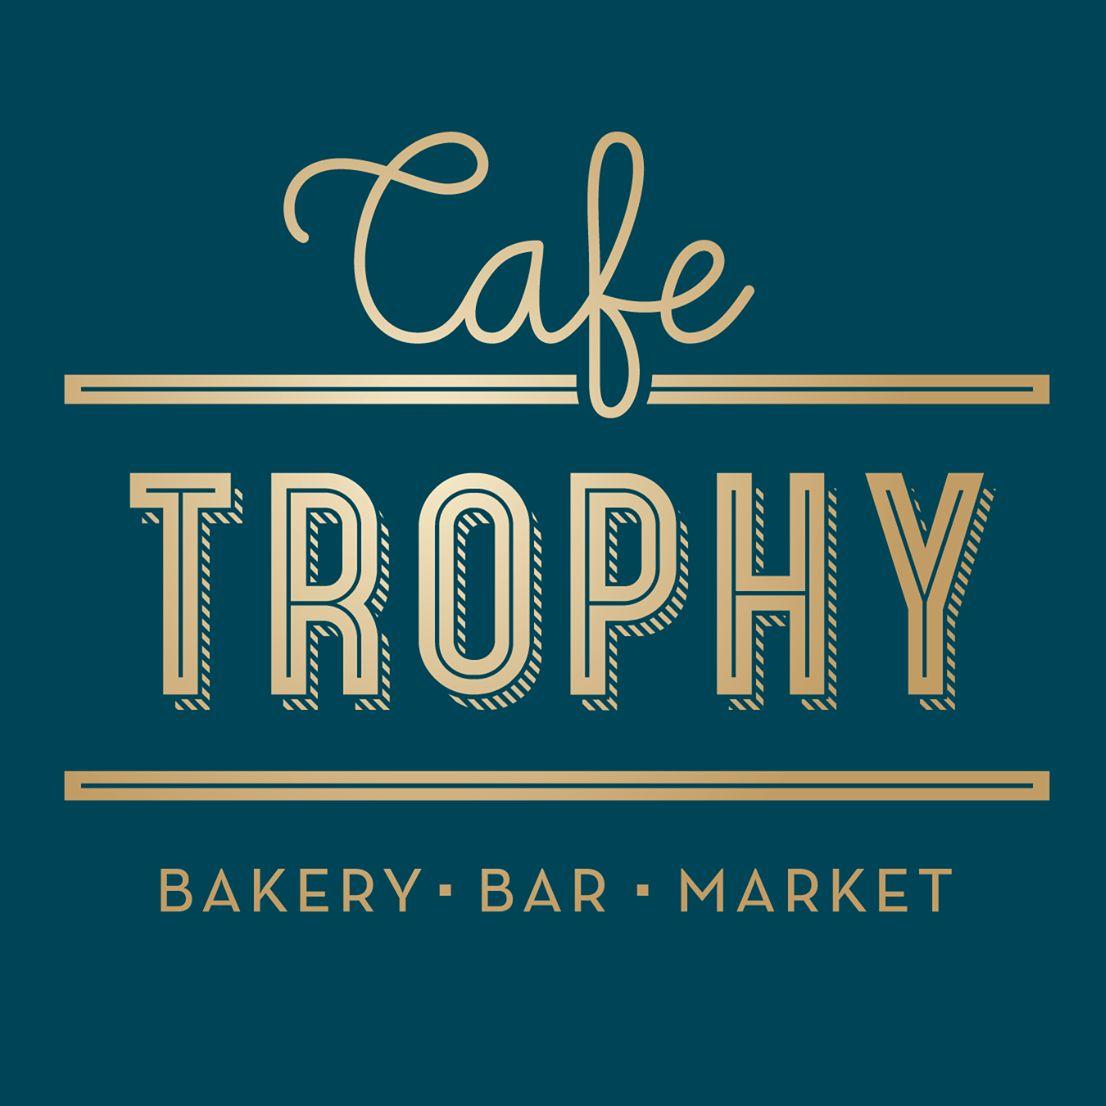 Cafe trophy sdhfou